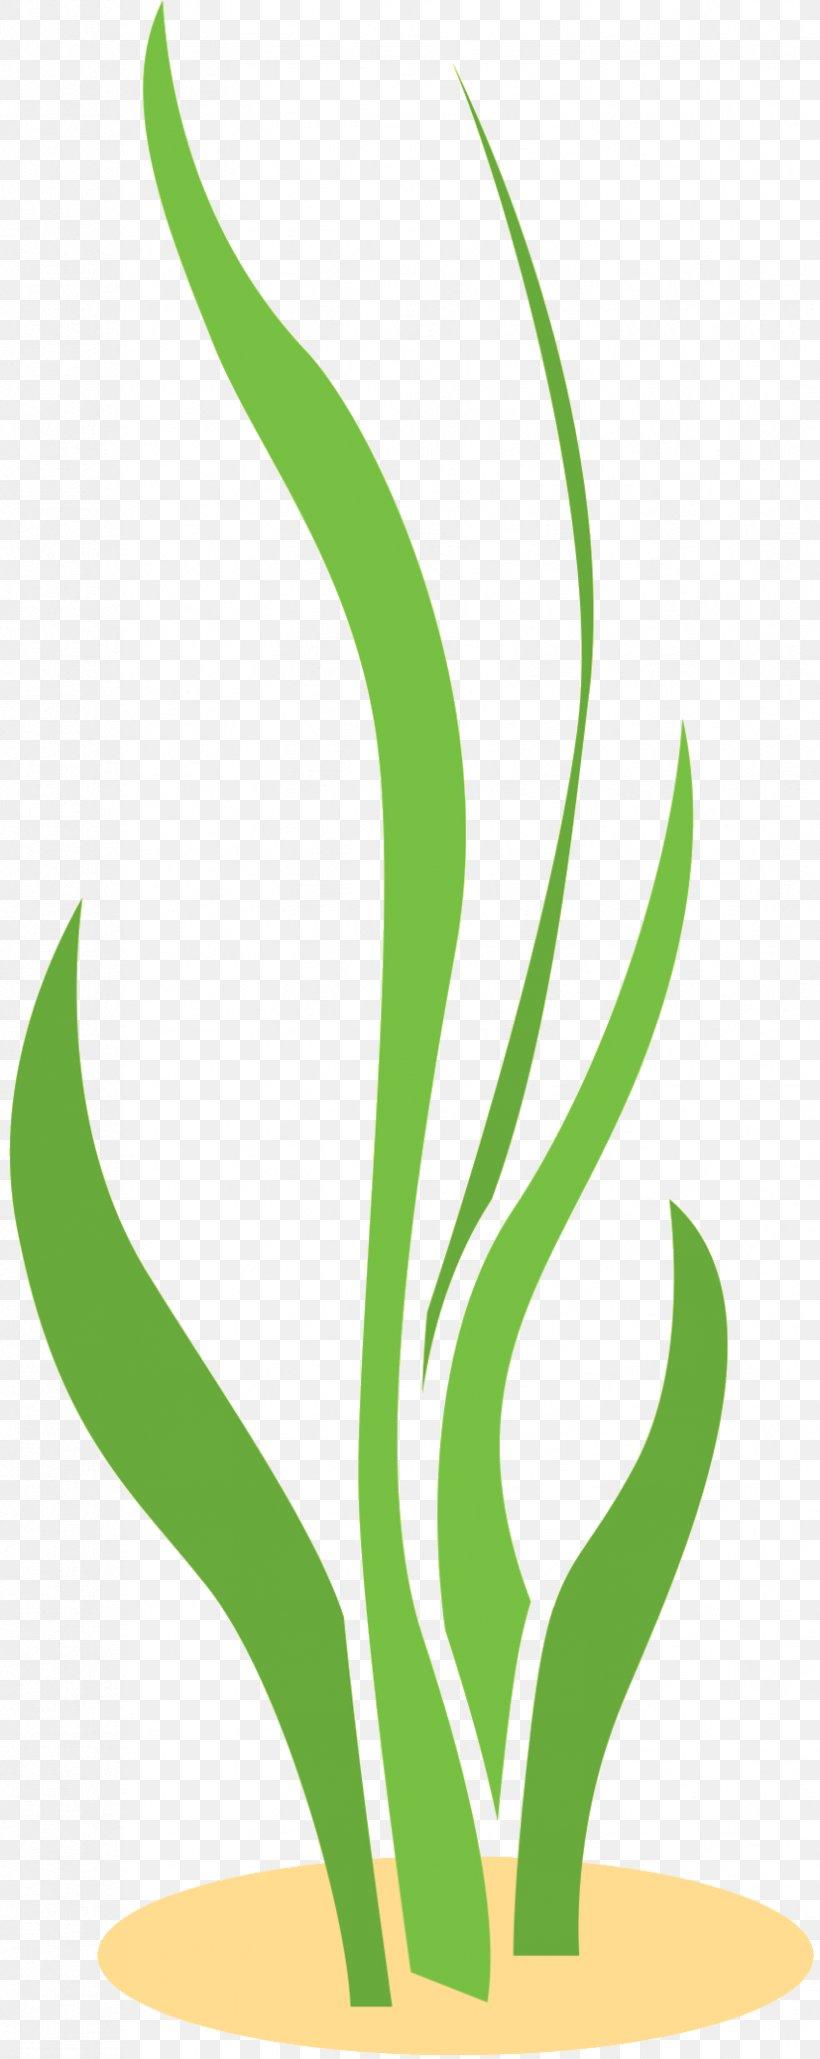 Leaf Clip Art Plant Stem Line Commodity, PNG, 827x2077px, Leaf, Botany, Commodity, Flower, Grass Download Free